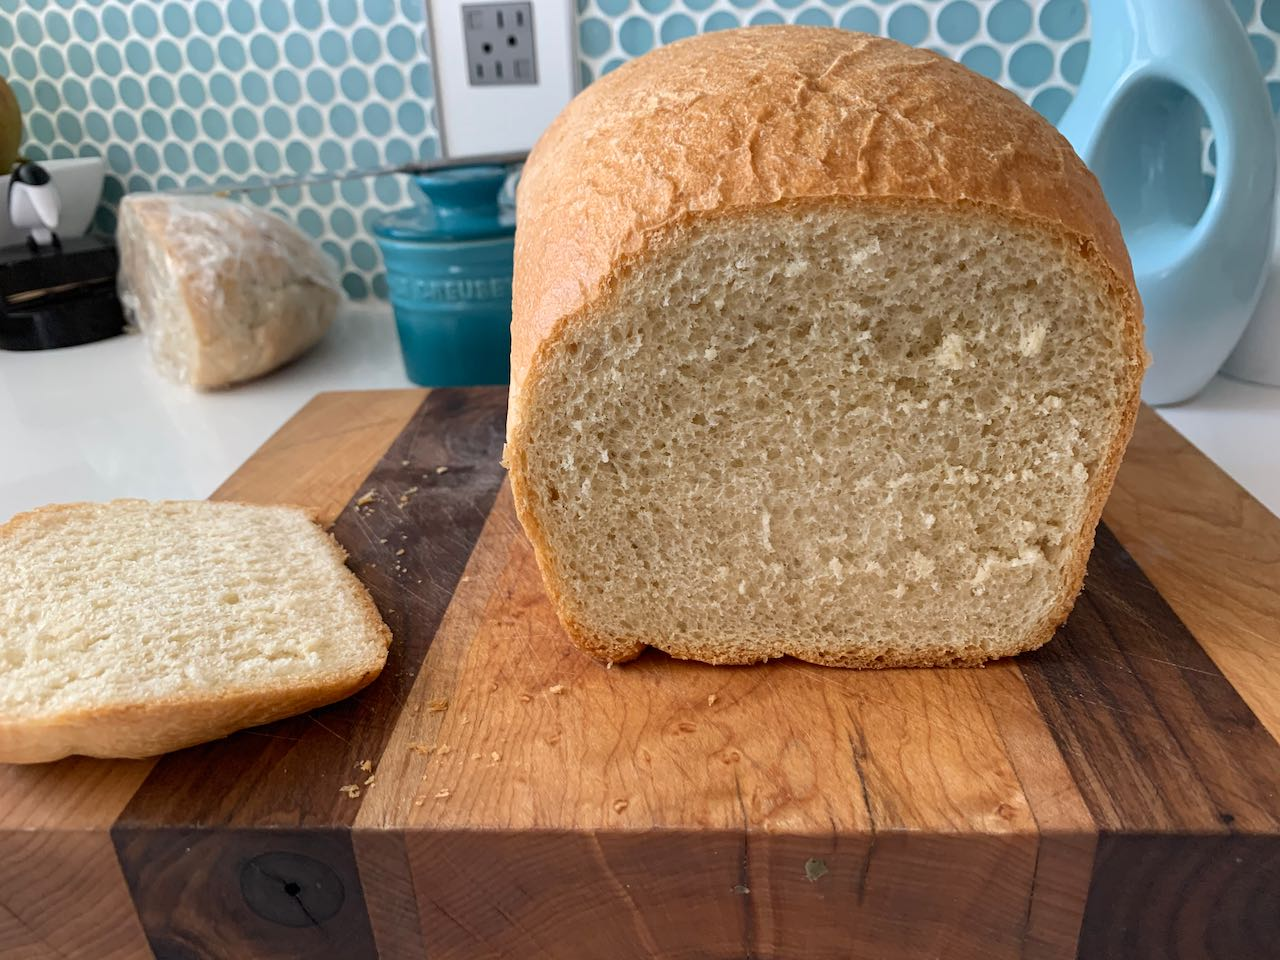 Basic High-Altitude Bread RachSte